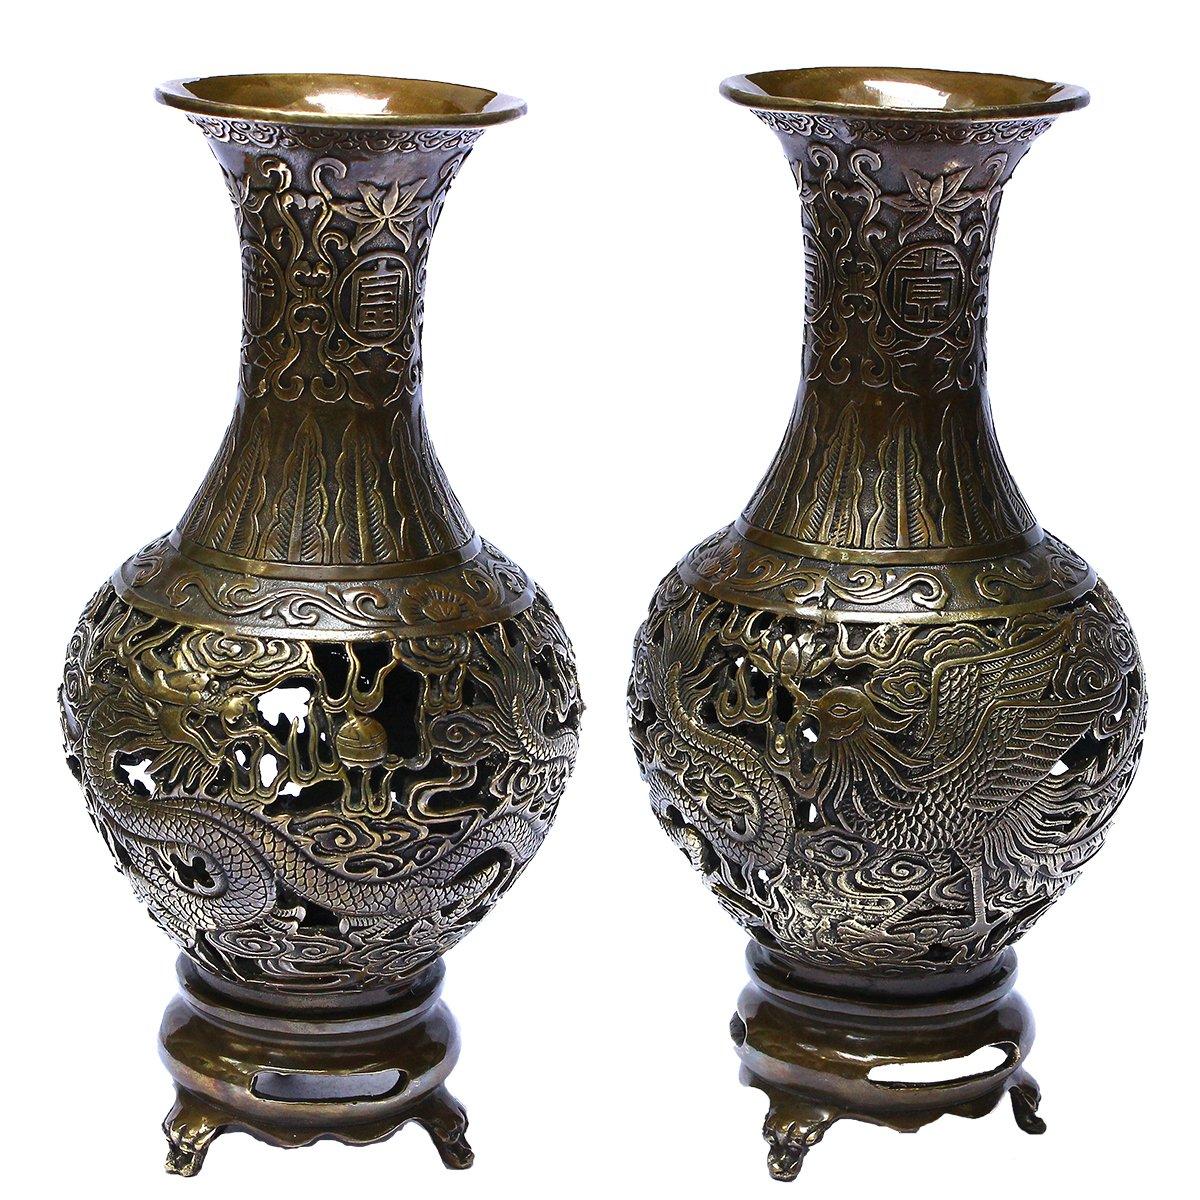 Handicrafts Brass Dragon&Phoenix Decorative Metal Hollow out Carved Three Foot Flower Pot / Vase Bronze Metal Bud Vases Showpieces Copper Finish - Hand Etched Pair/2pcs